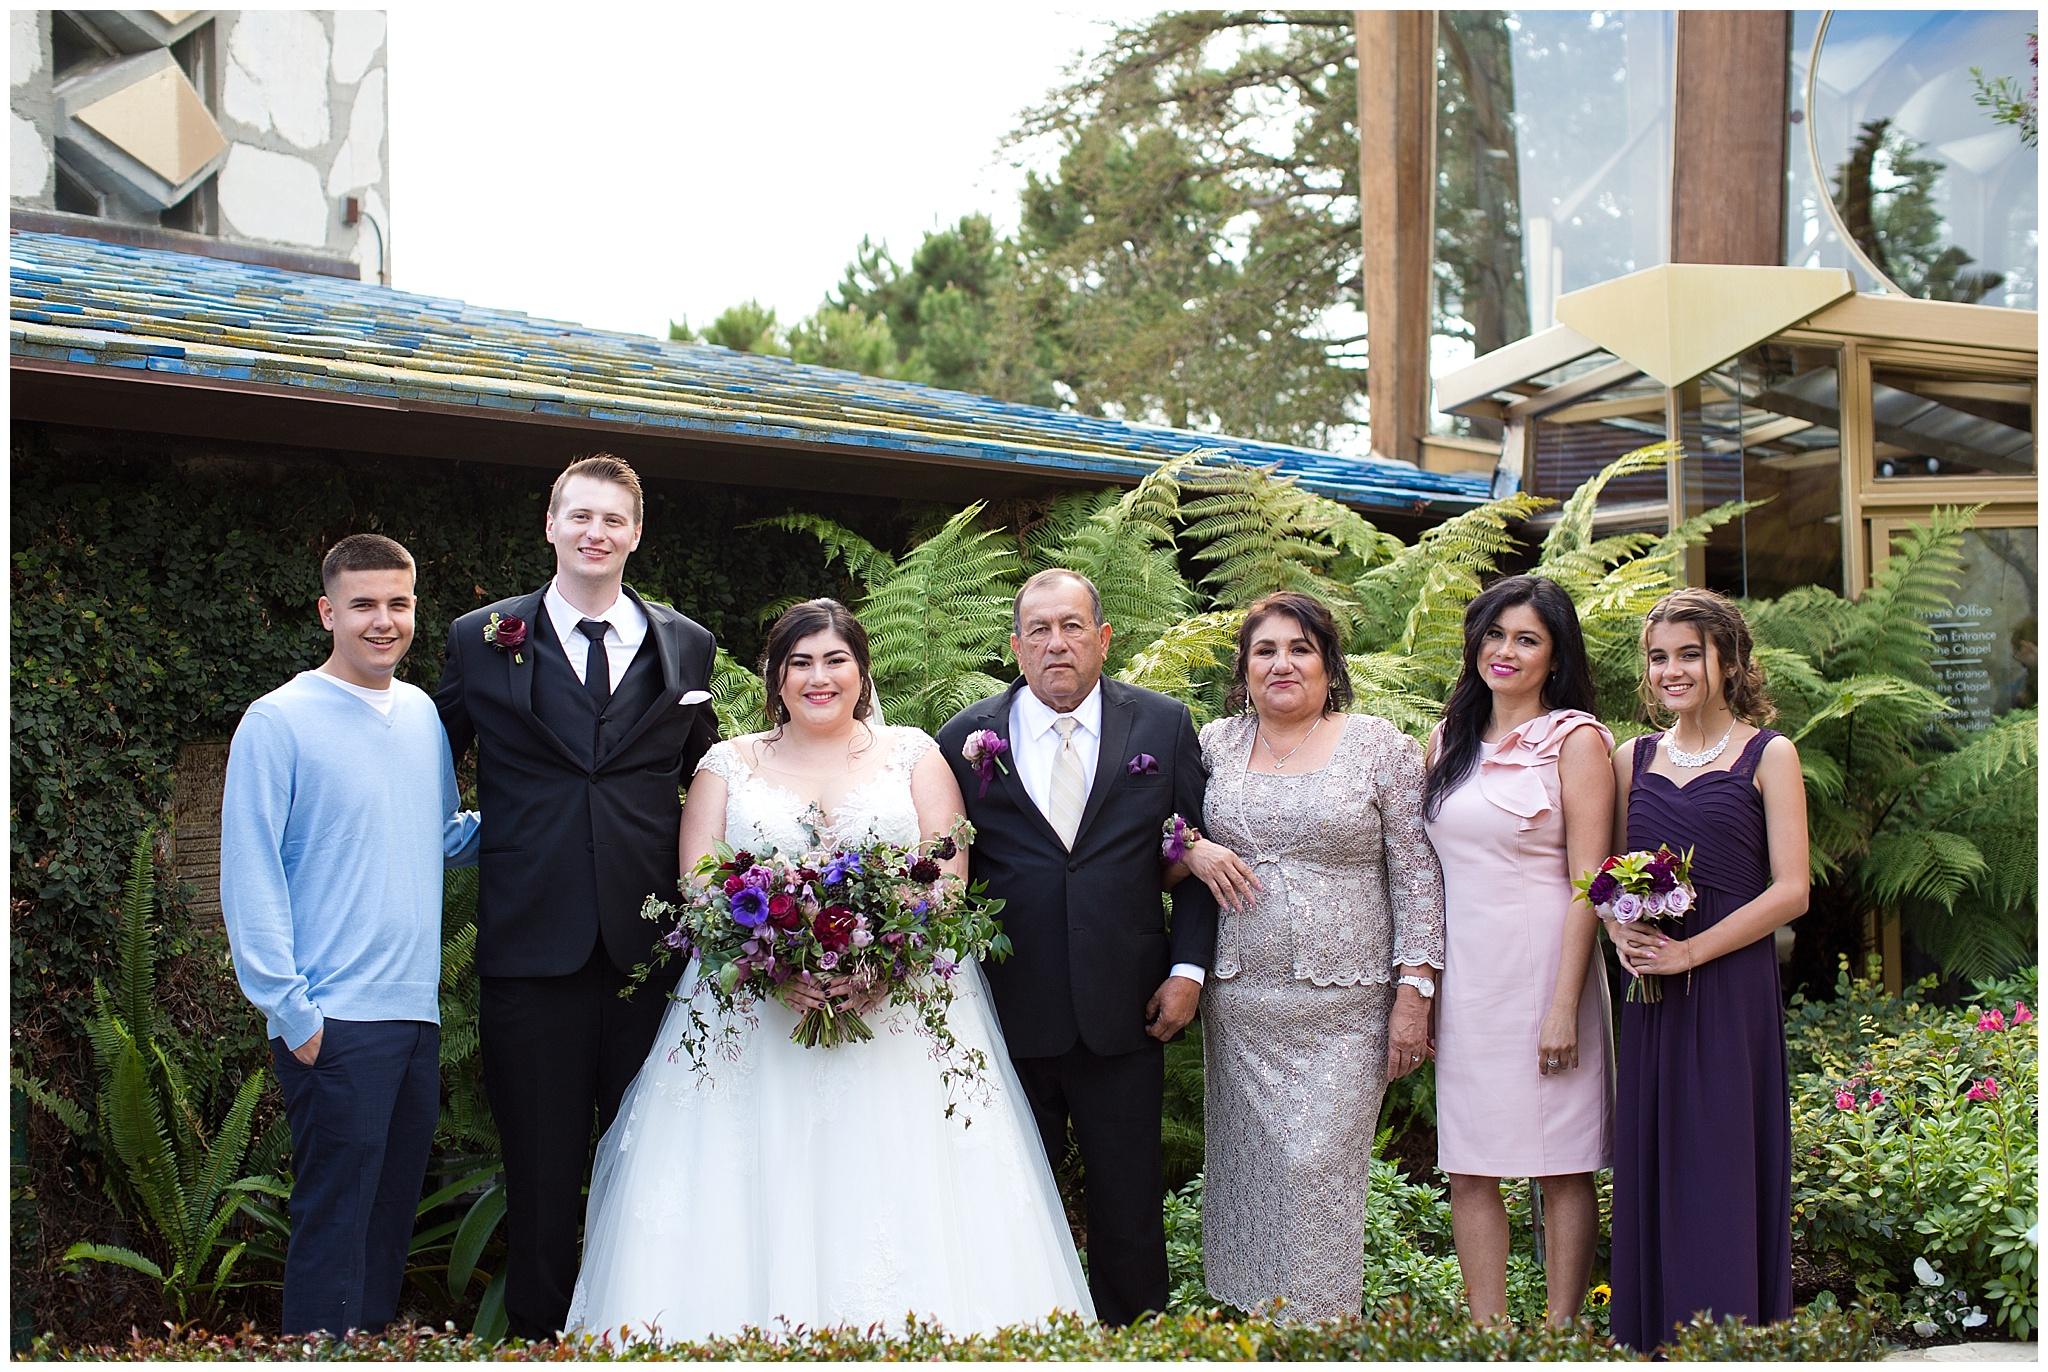 Carol_and_Grant_Wedding_3-3-18-7749.jpg